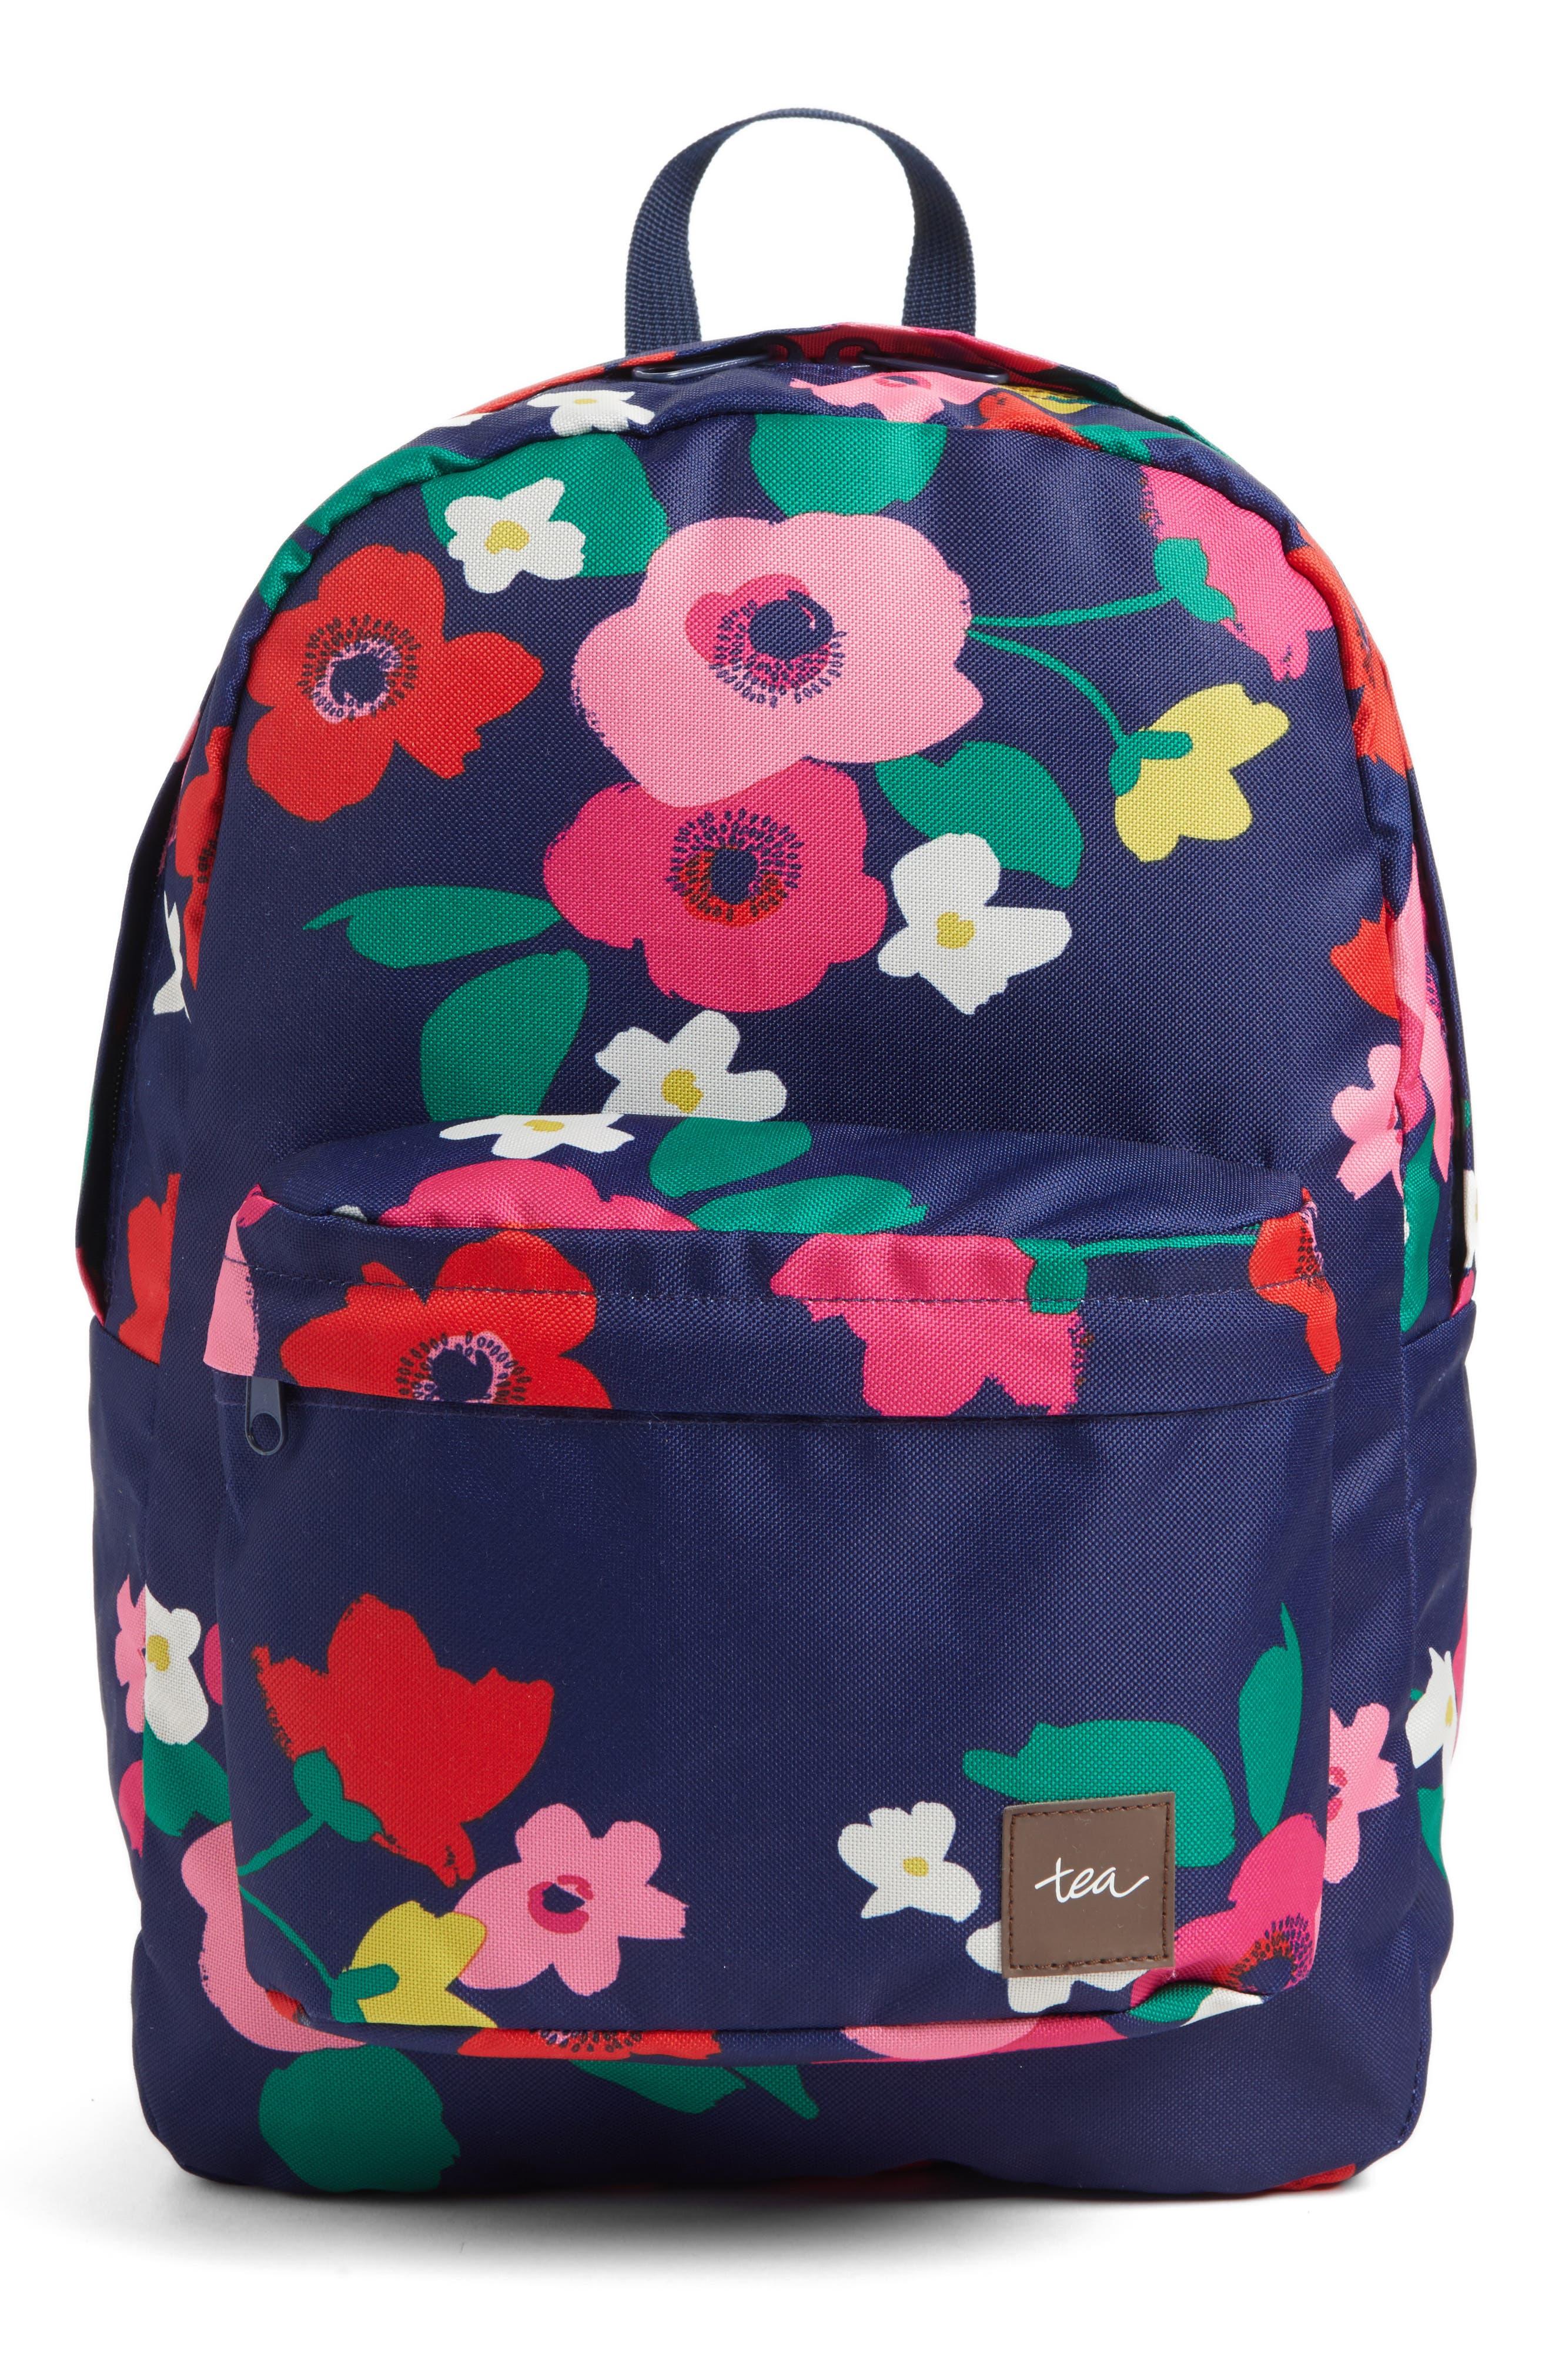 Alternate Image 1 Selected - Tea Collection Scotland Garden Backpack (Kids)